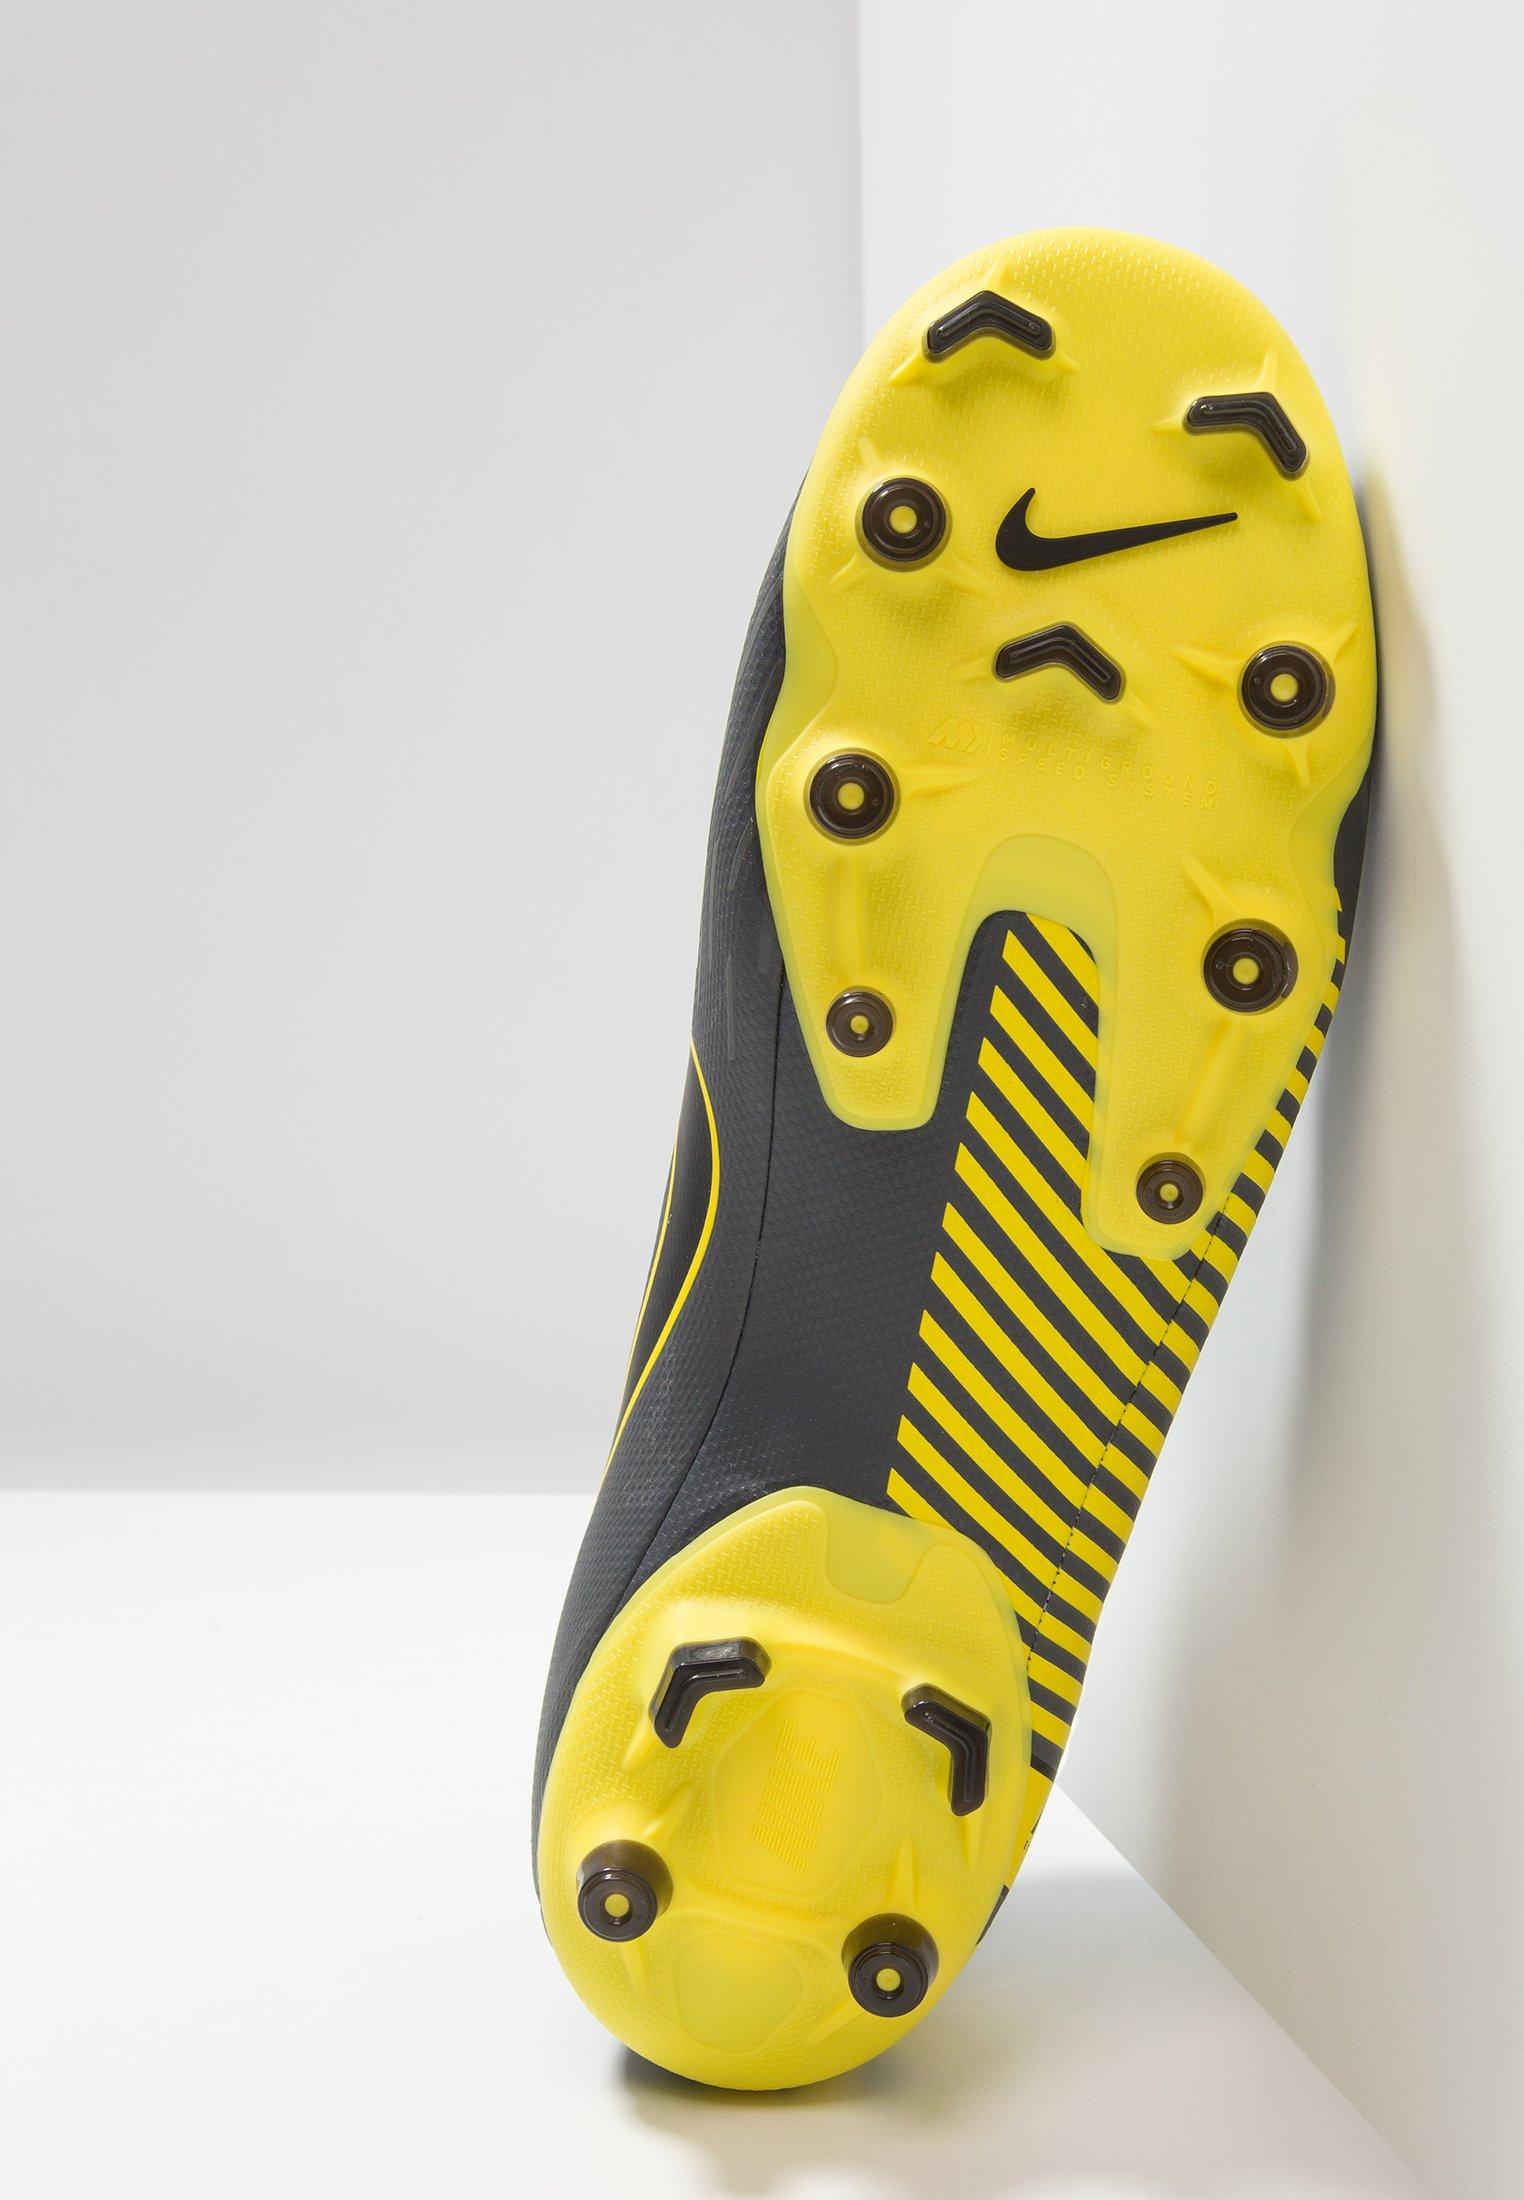 Nike 6 Academy black Yellow Foot Mercurial MgChaussures Performance Dark À Grey De Crampons opti 1FTlKJc